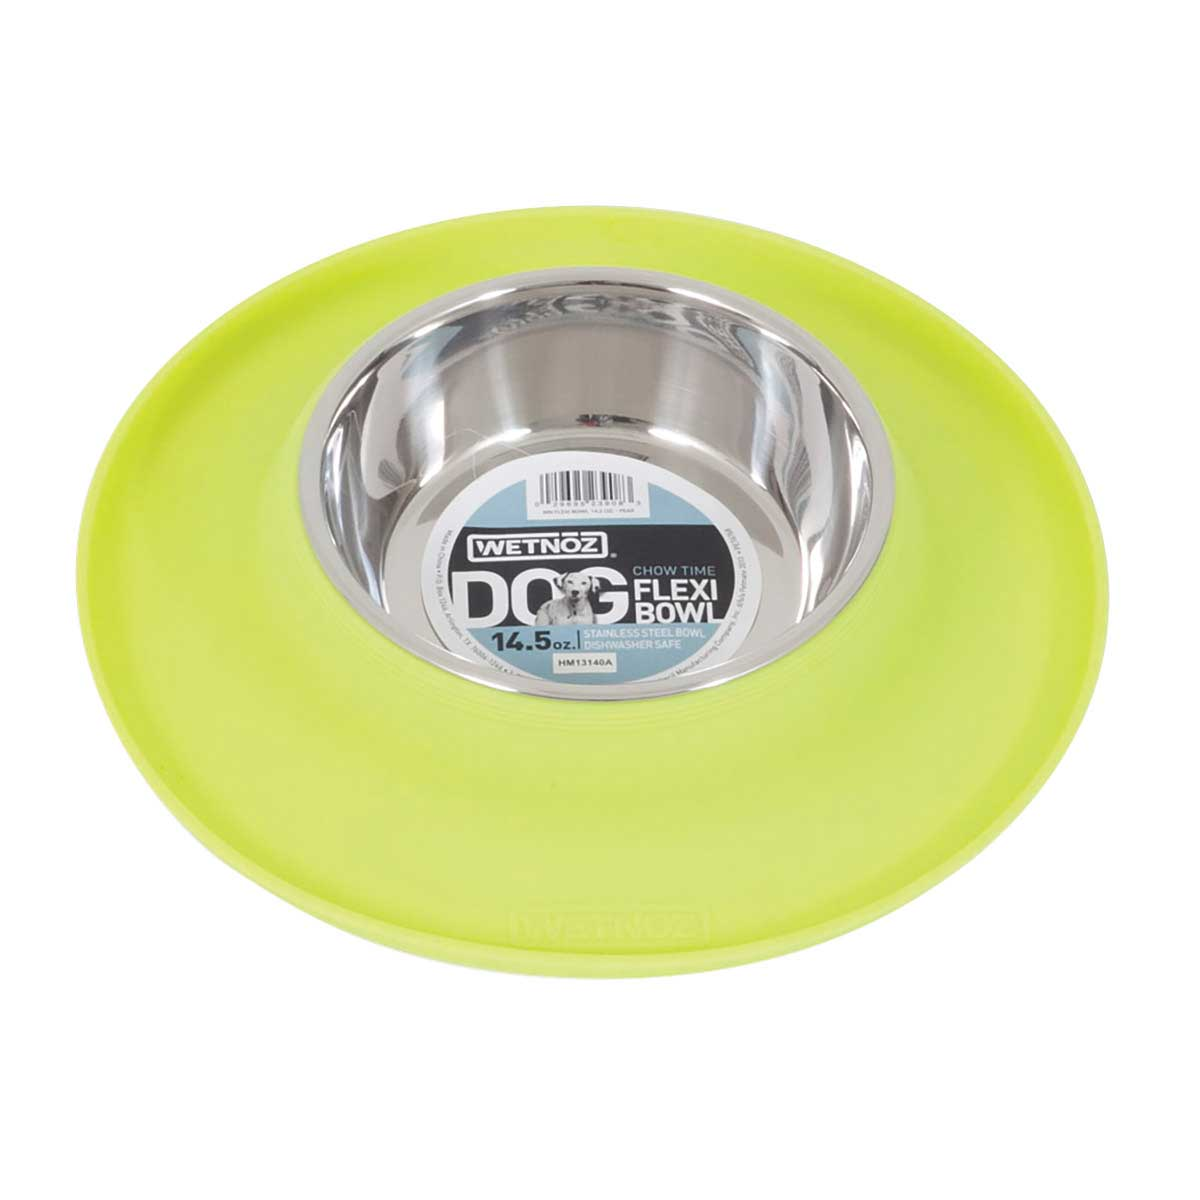 Wetnoz Flexi Bowl 14.5 ounces - Pear Green